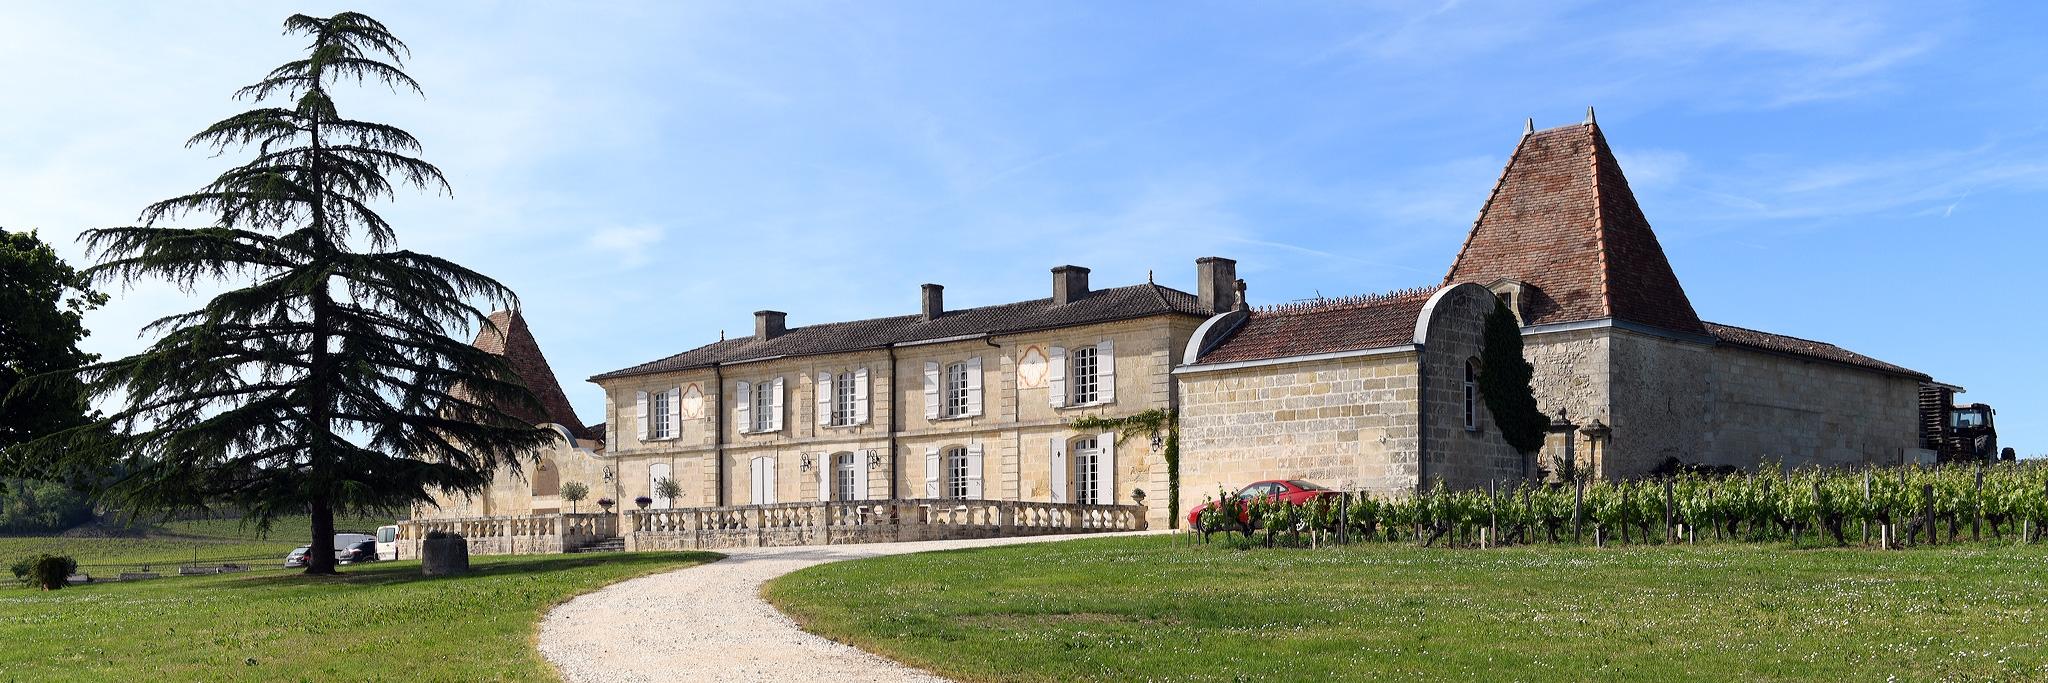 Chateau Lassegue